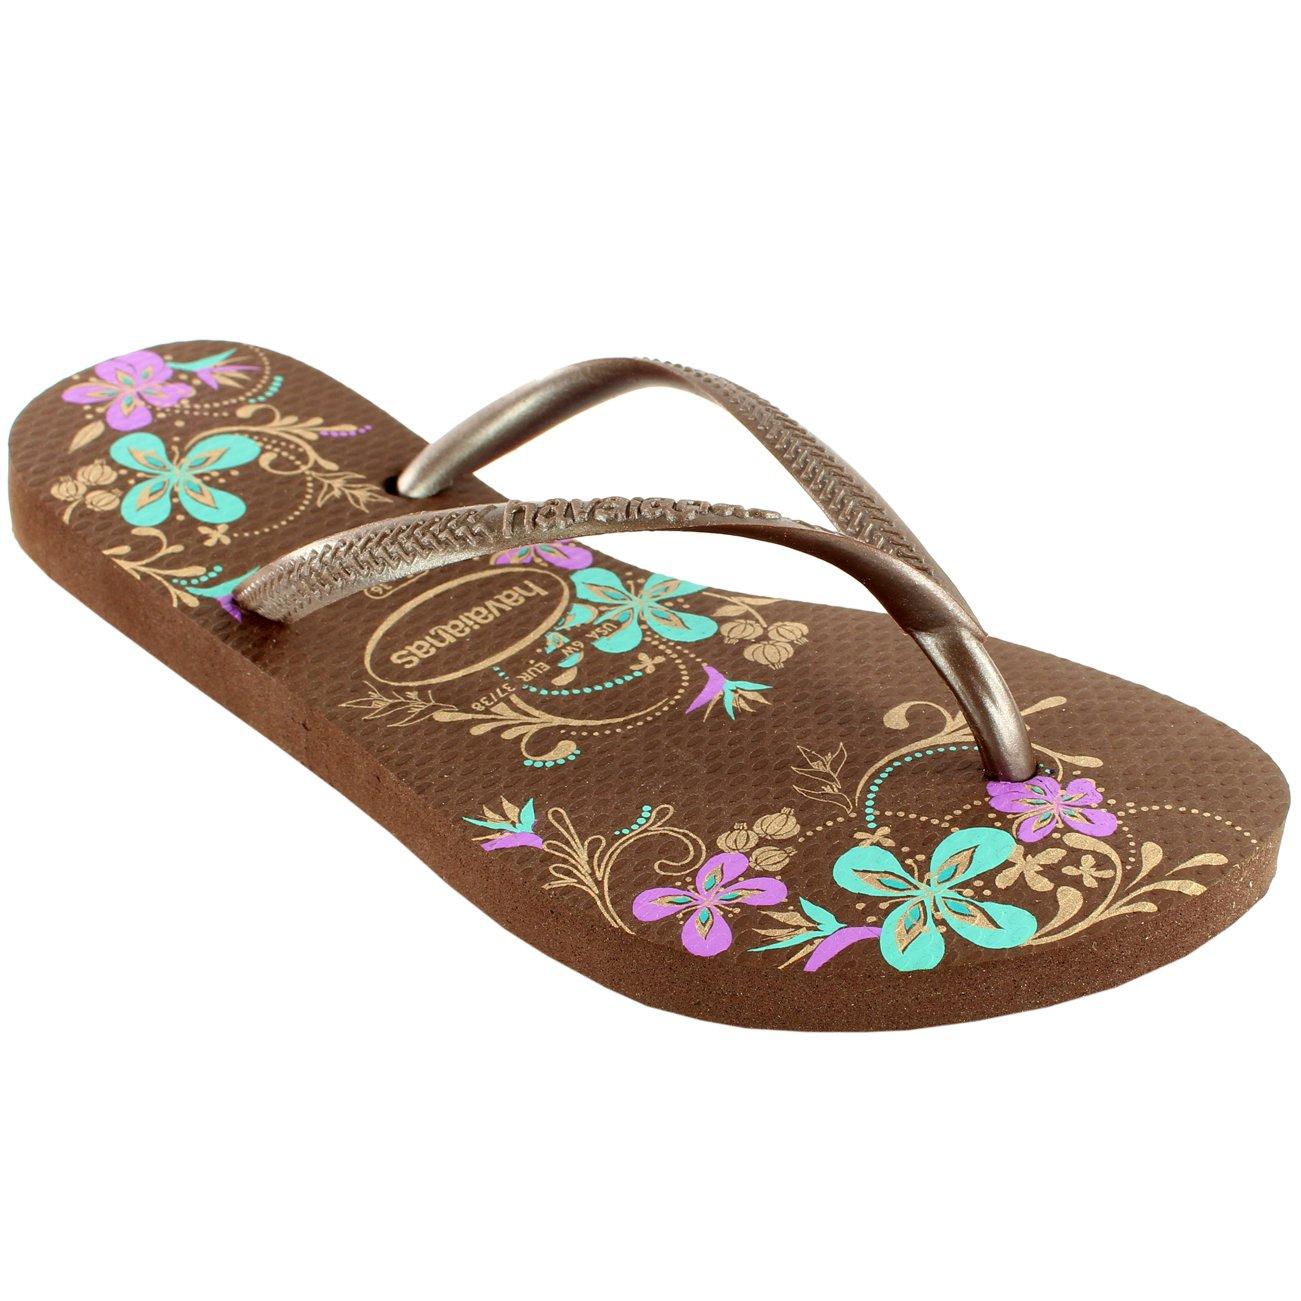 7b07148df87c Havaianas Womens Slim Season Beach Flip Flops Summer Sandals New UK Sizes  1-8  Amazon.co.uk  Shoes   Bags